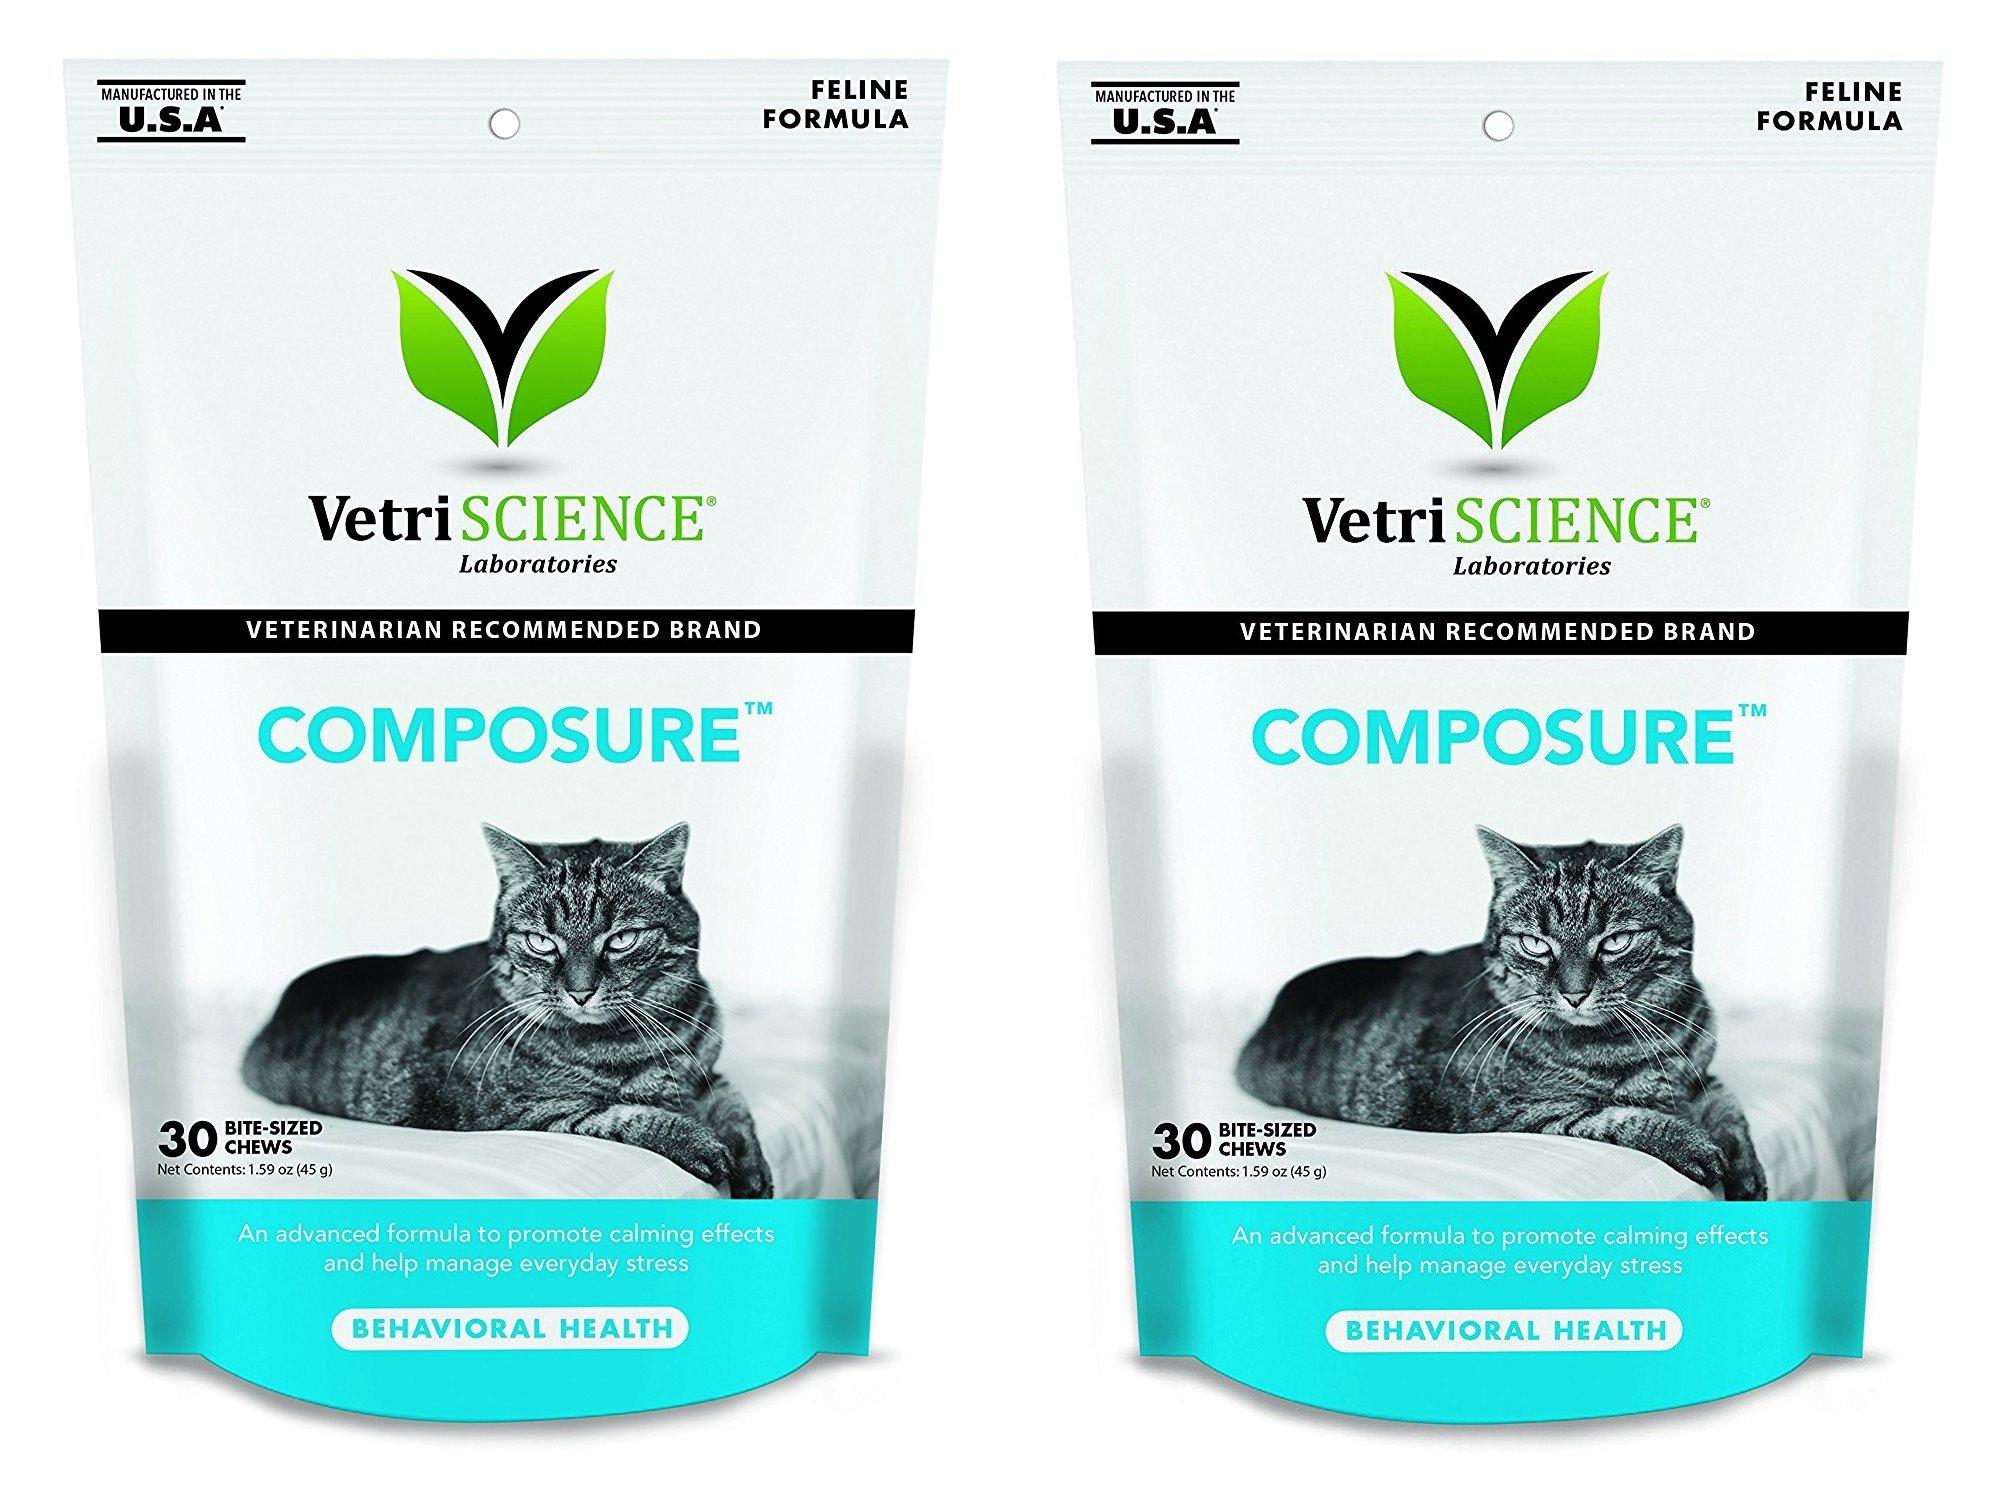 VetriScience Laboratories Composure, Calming Formula for Cats Size:60 Bite-Sized Chews